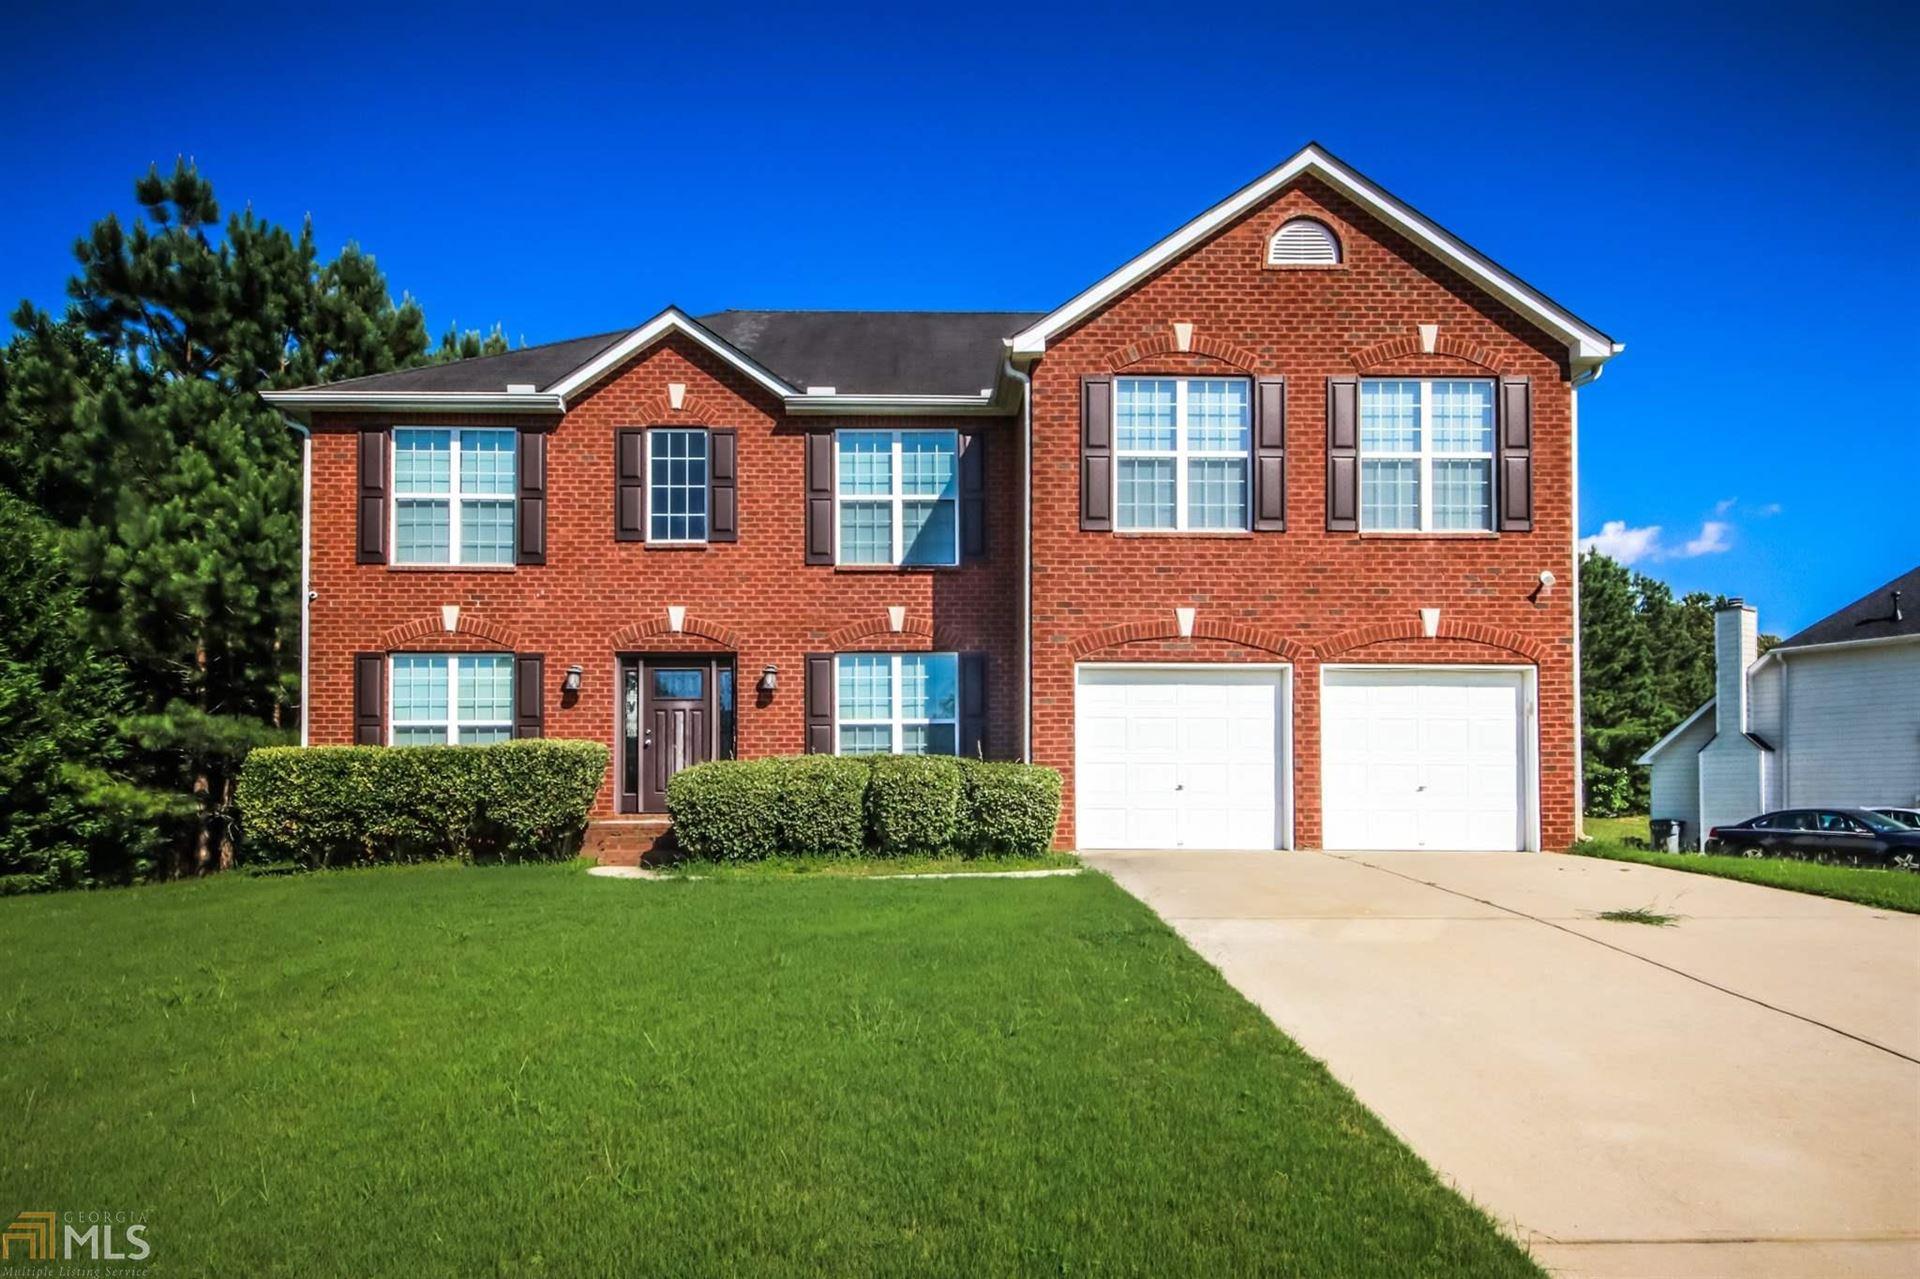 10108 Hemlock Way, Jonesboro, GA 30238 - MLS#: 8859341